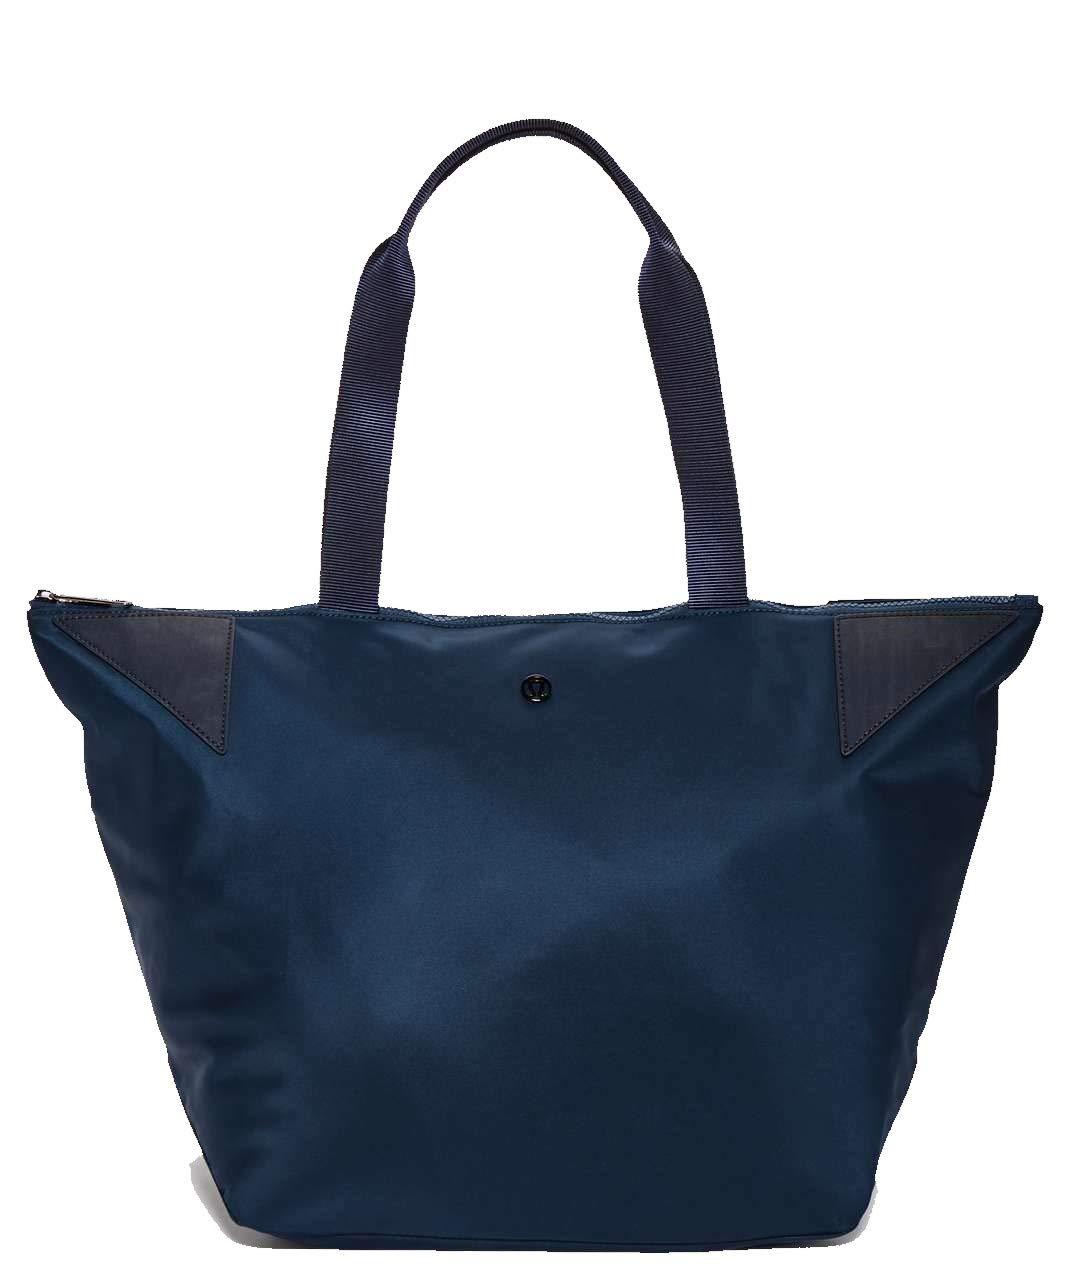 Lululemon ACUTE TOTE 23L Bag Mineral Blue Midnight Navy MINB MDNI (Mineral Blue Midnight Navy)